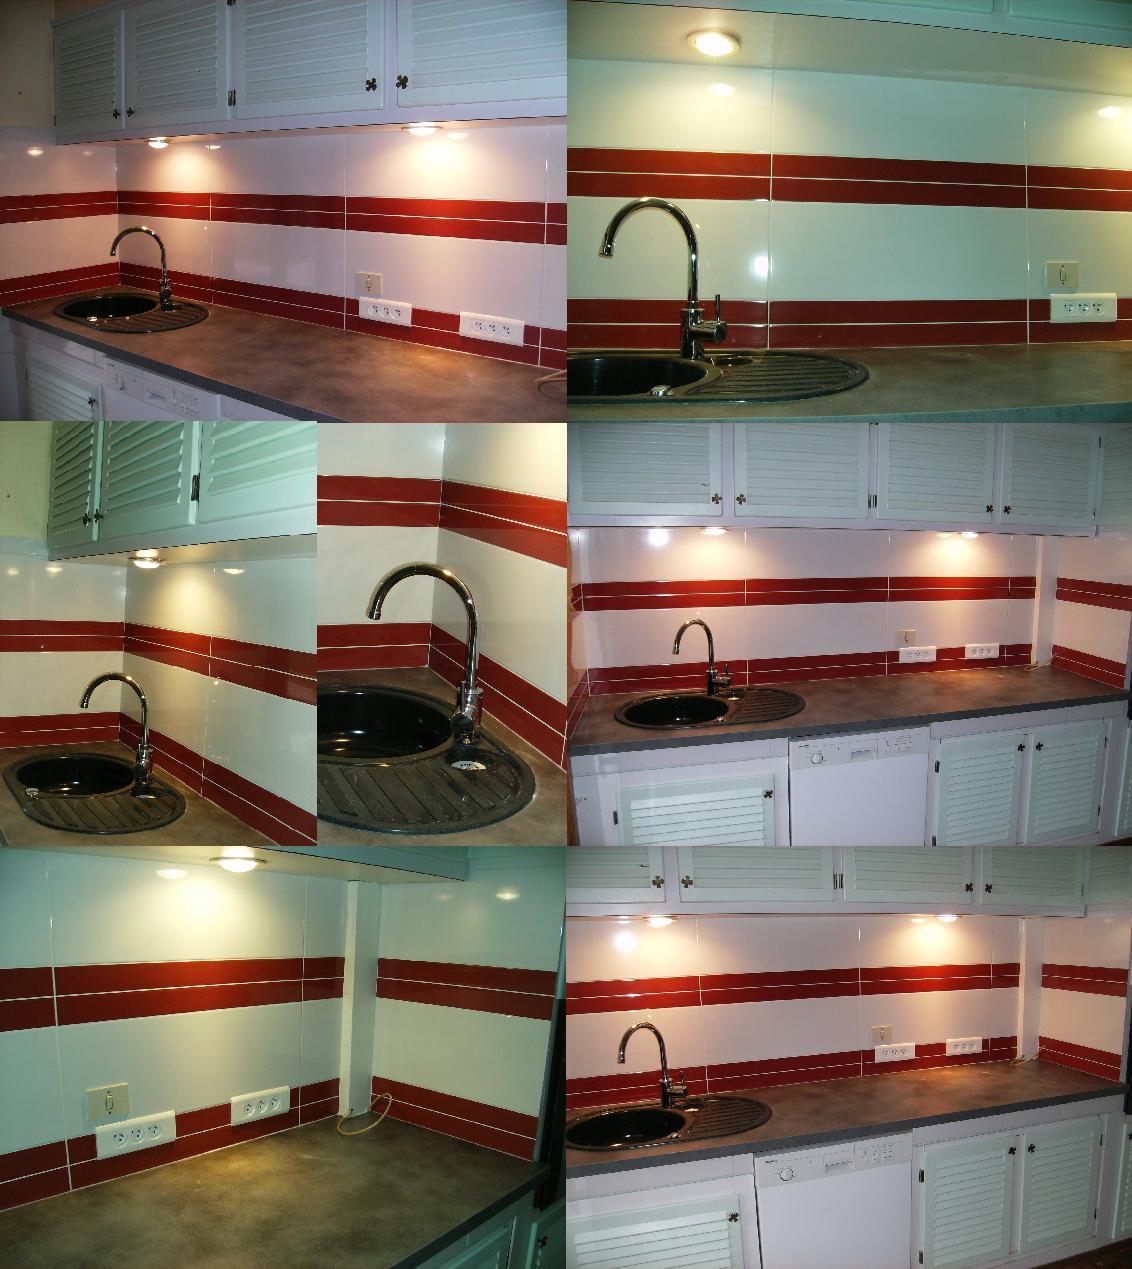 frise faience cuisine 20170822192104. Black Bedroom Furniture Sets. Home Design Ideas